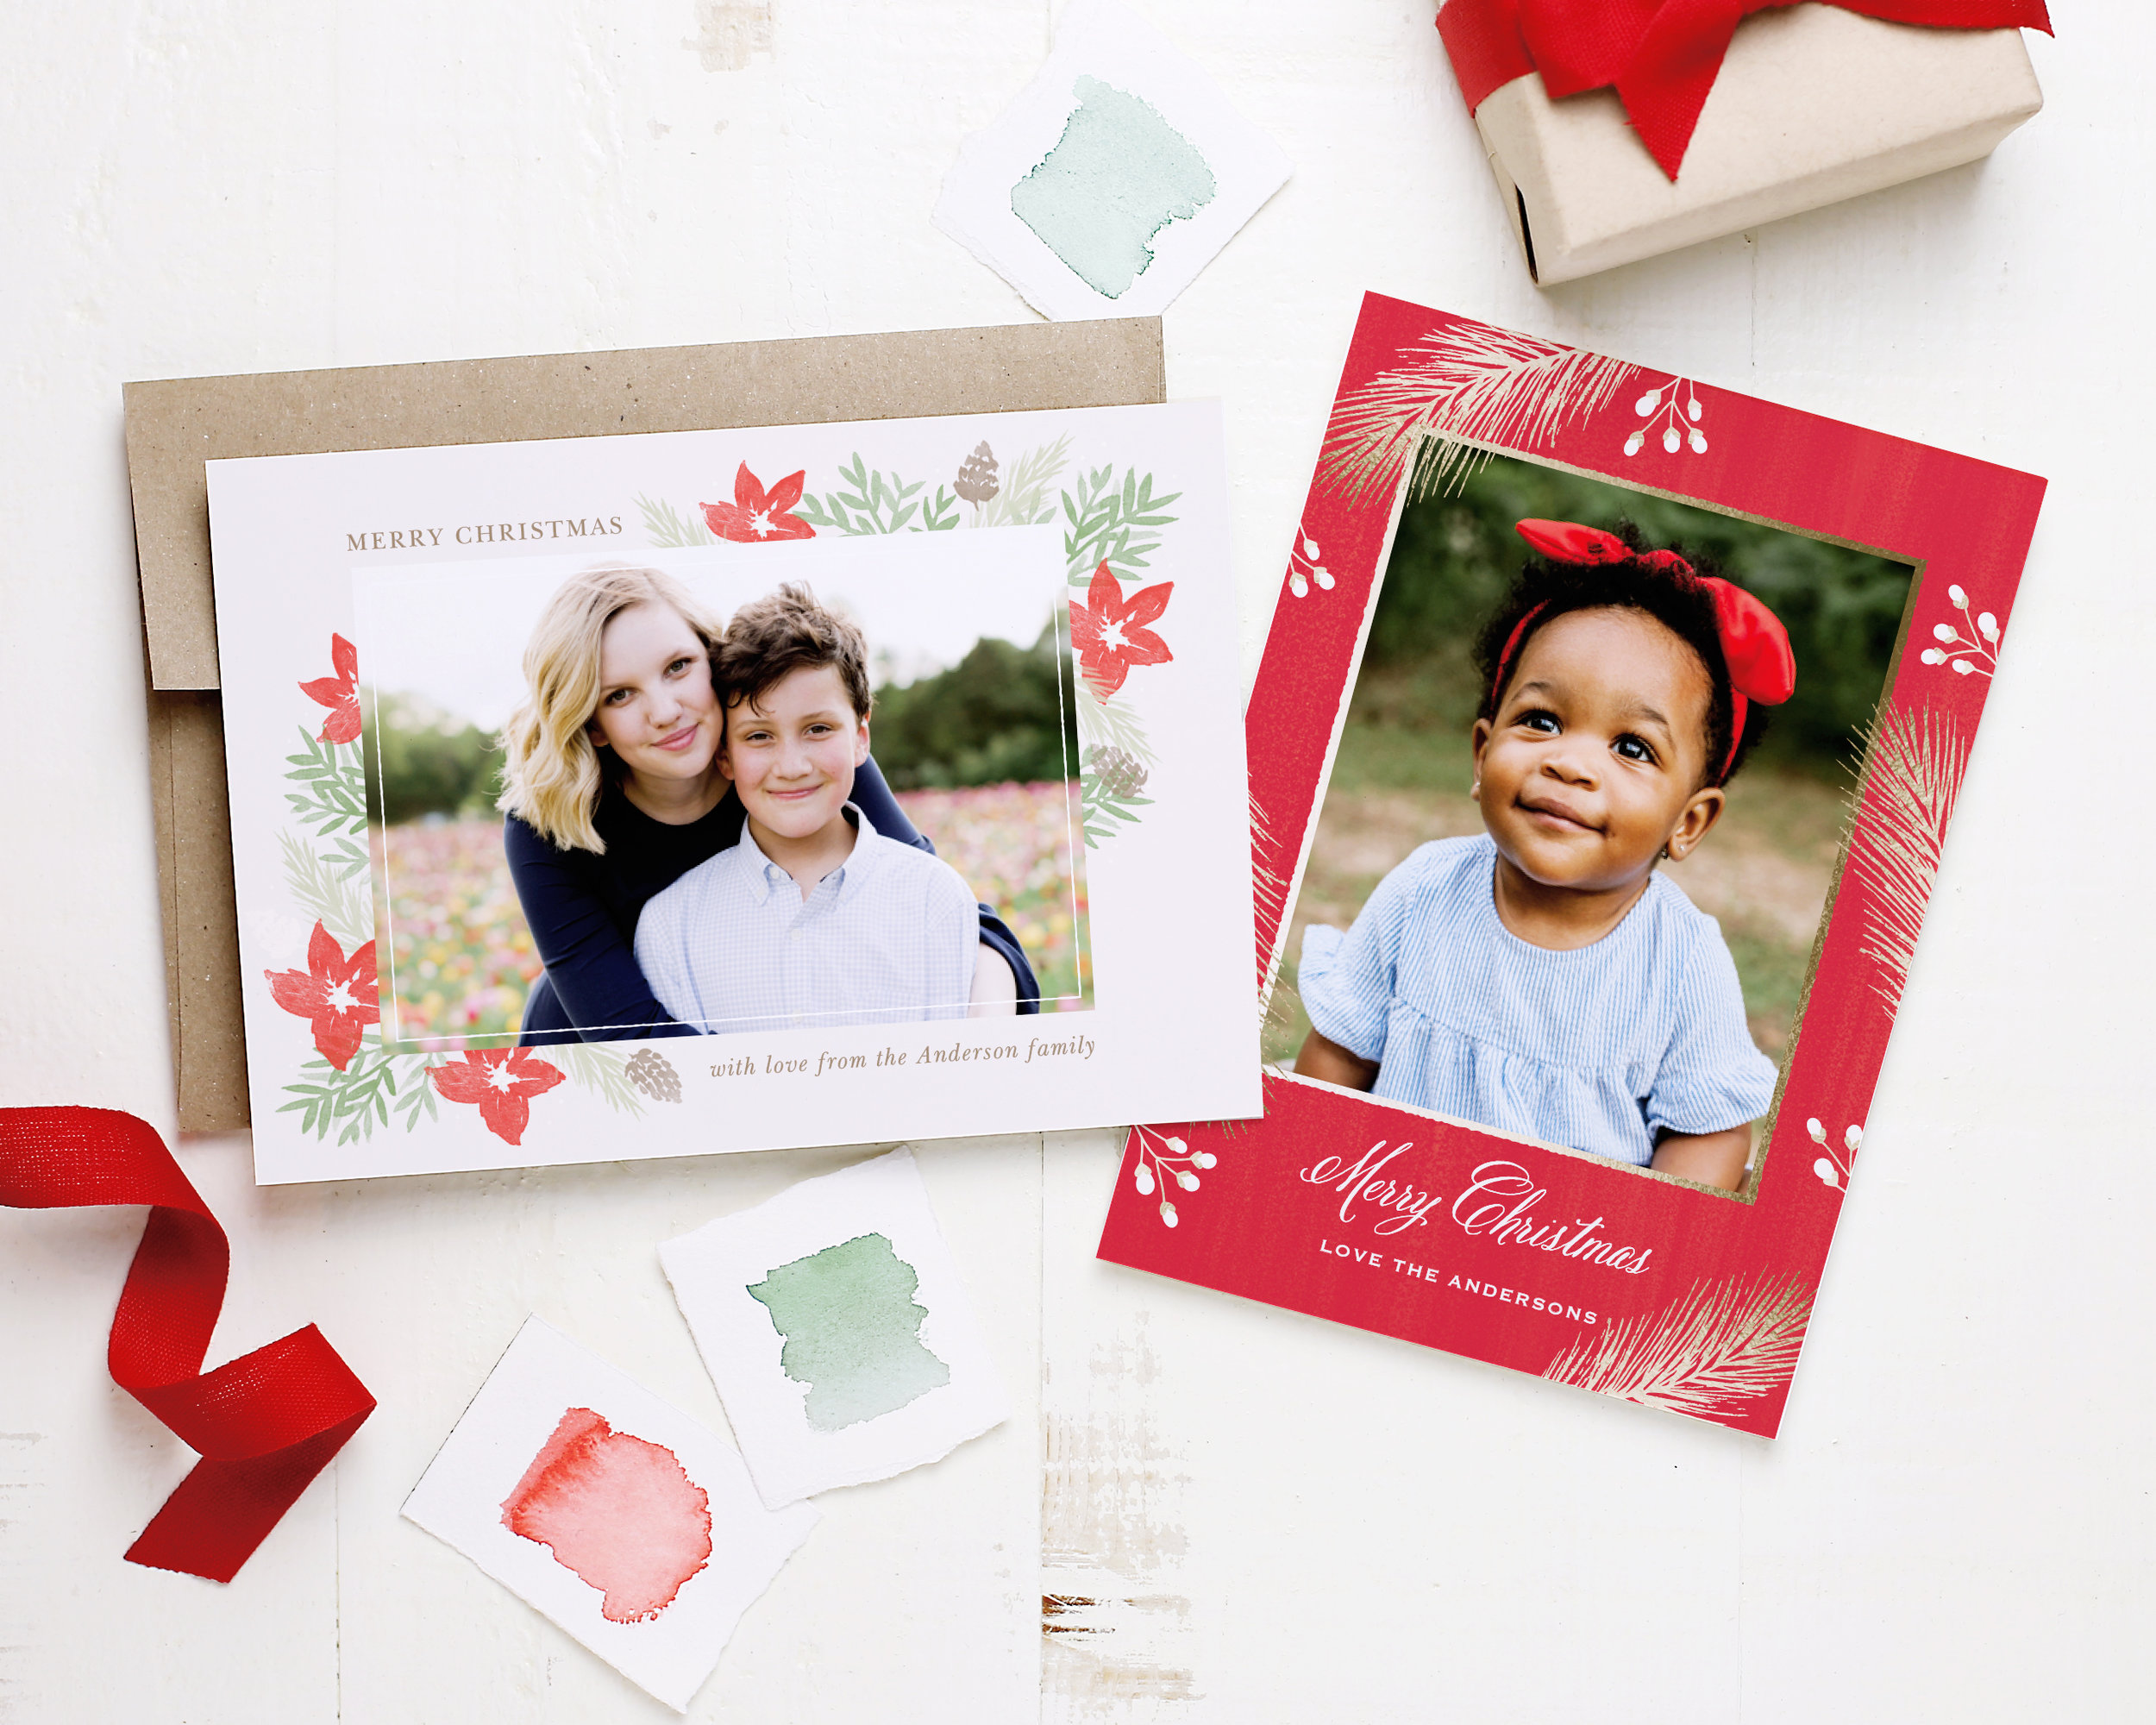 Basic_Invite_Christmas_Photo_Cards_5.jpg